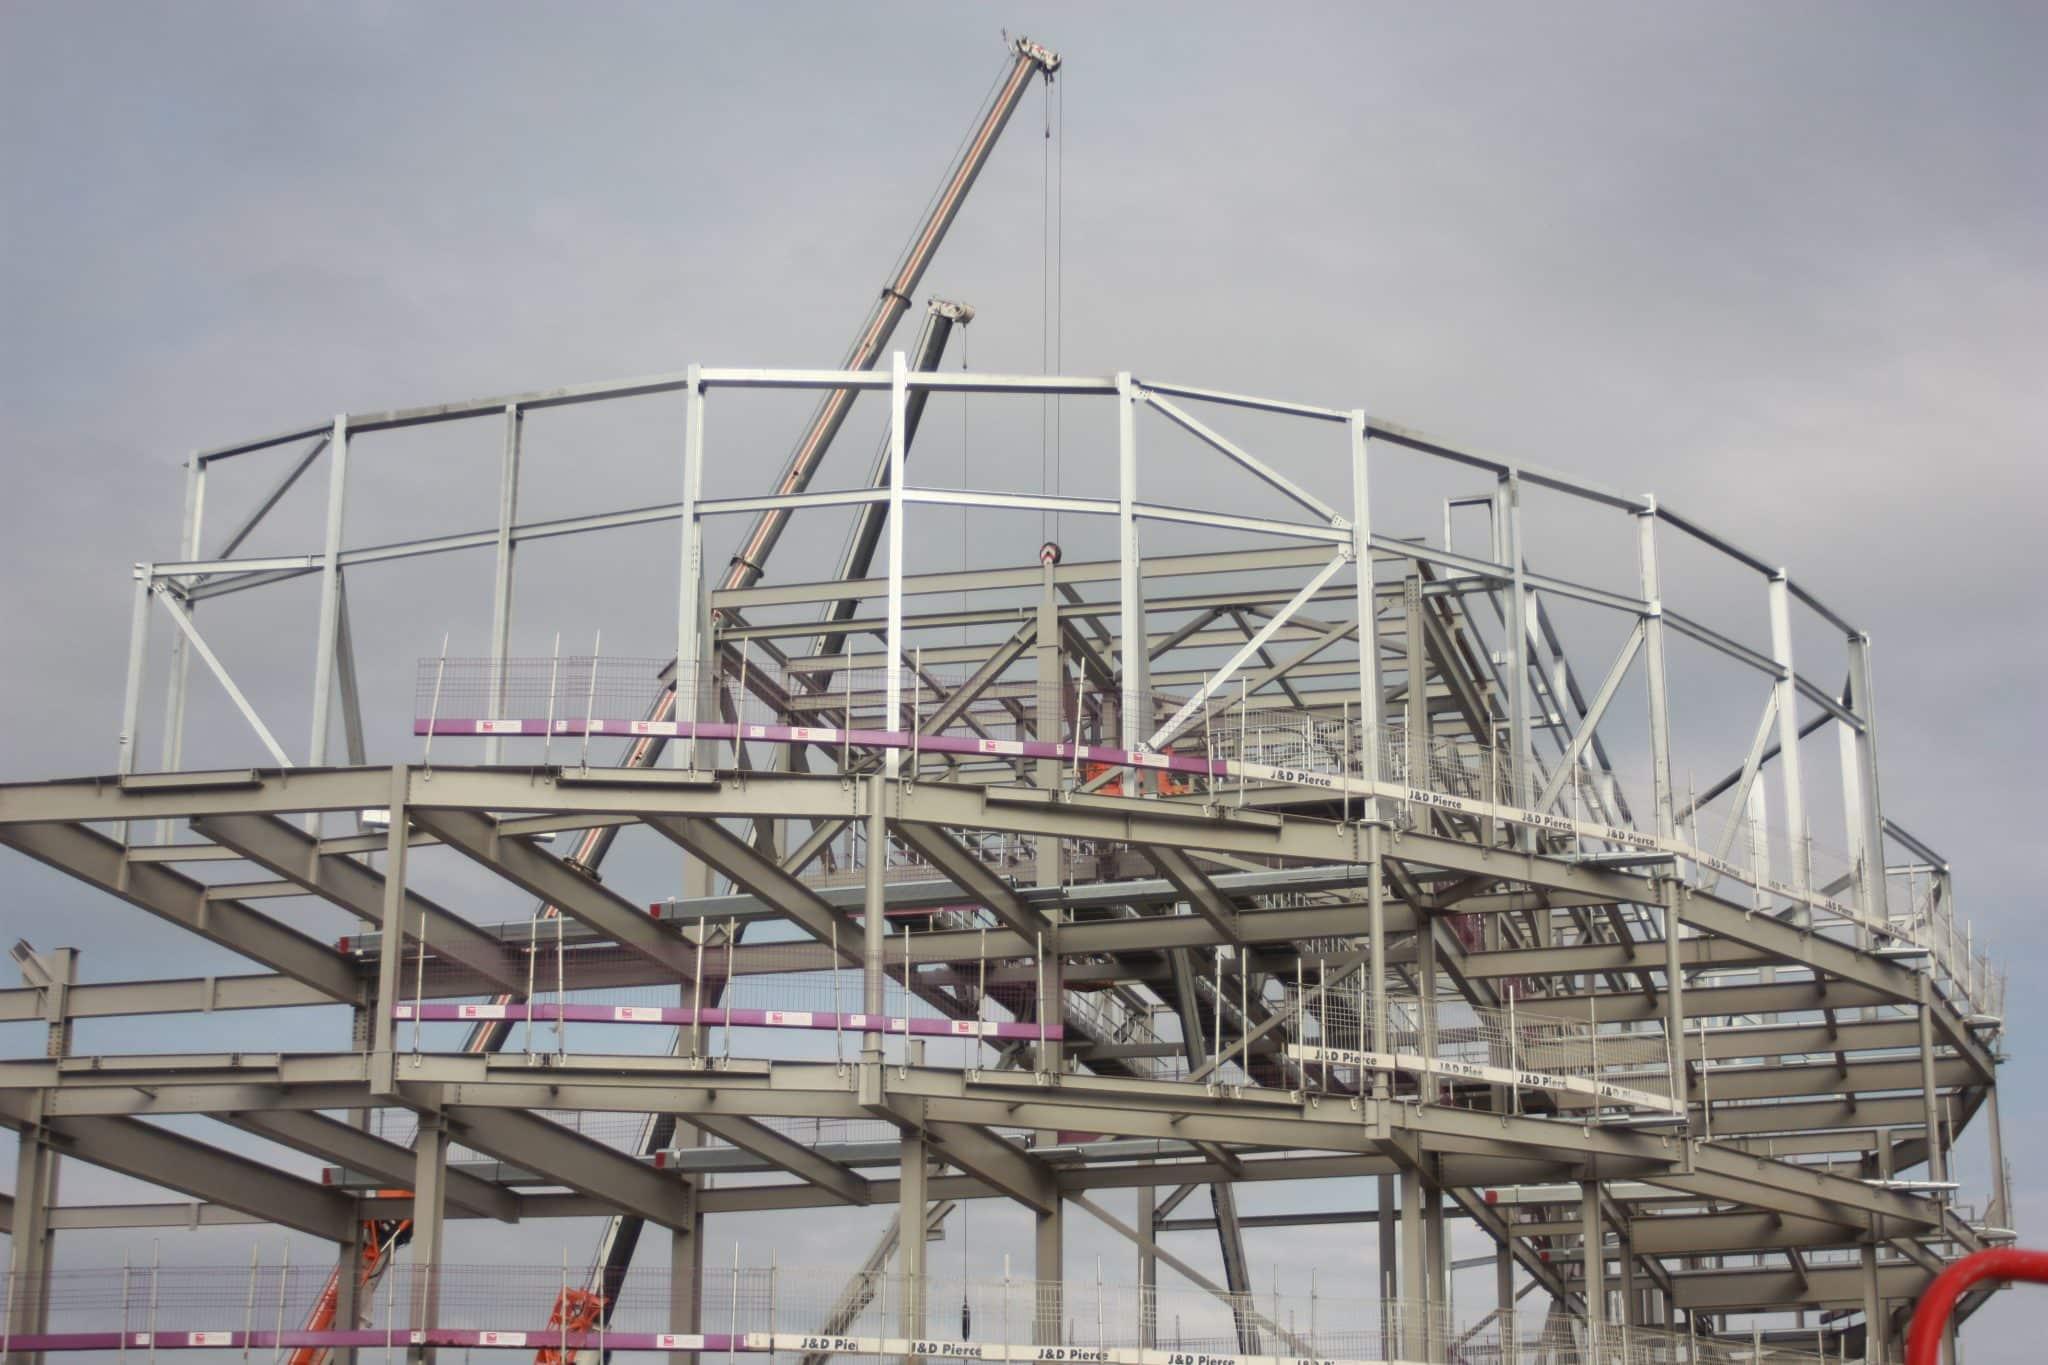 Swansea Arena - Structural Steel Frame - JDPierce